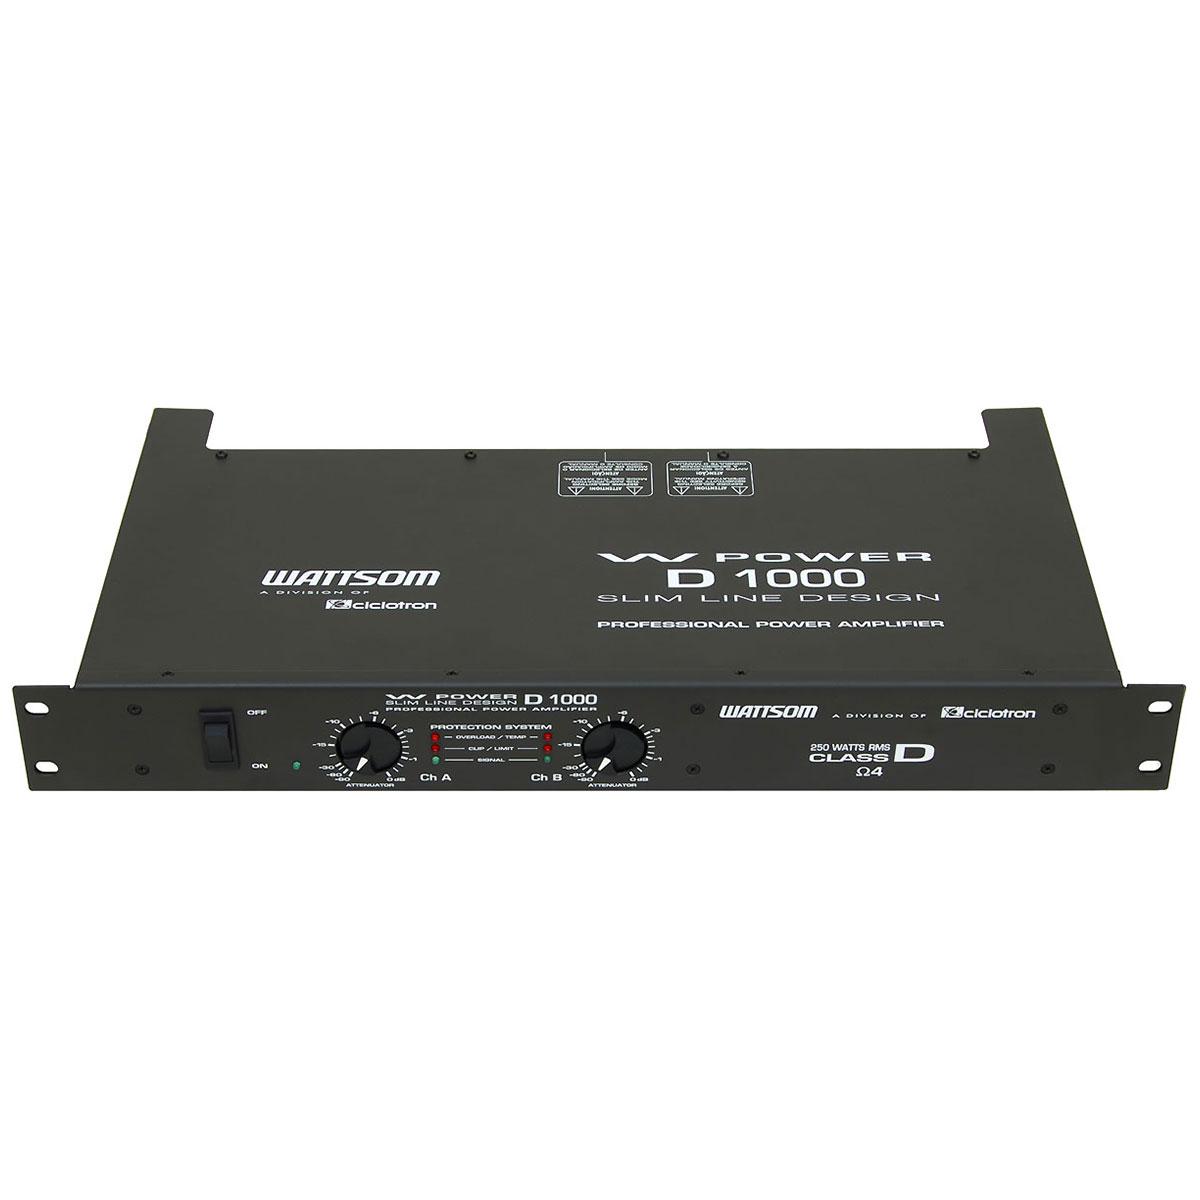 Amplificador Estéreo 2 Canais 250W ( Total ) W Power D 1000 - Ciclotron